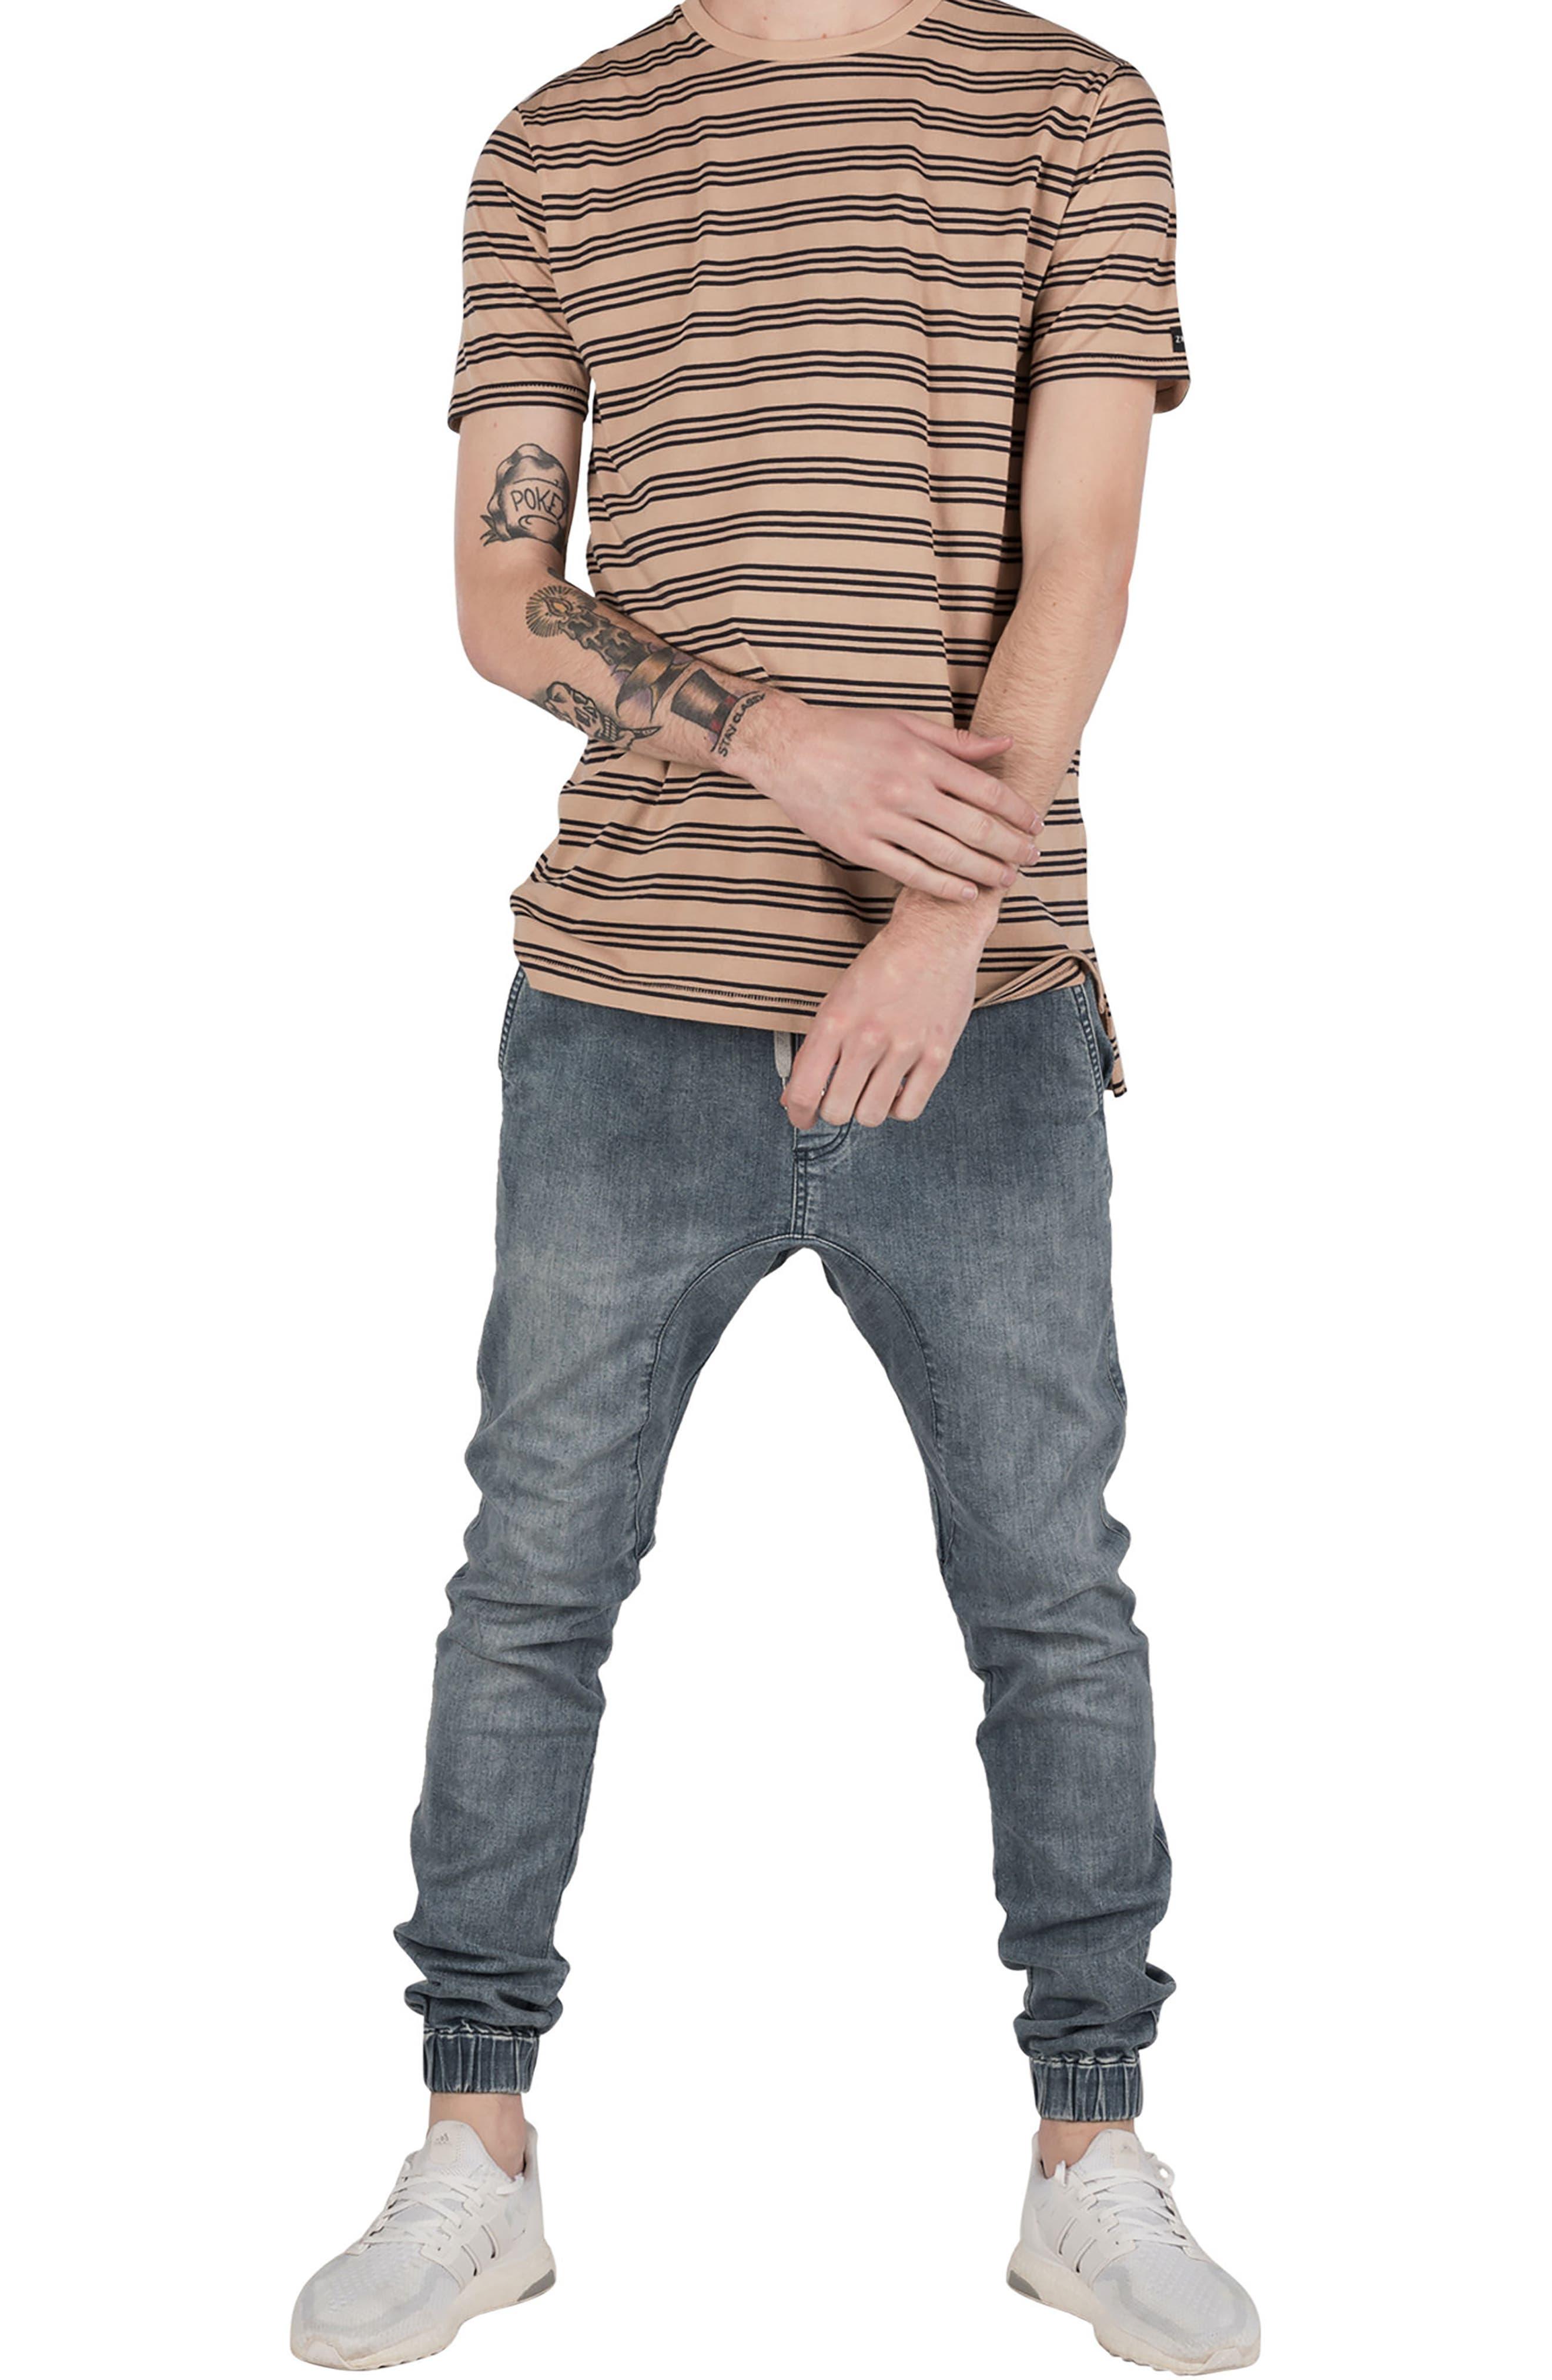 Flintlock Stripe T-Shirt,                             Alternate thumbnail 4, color,                             251